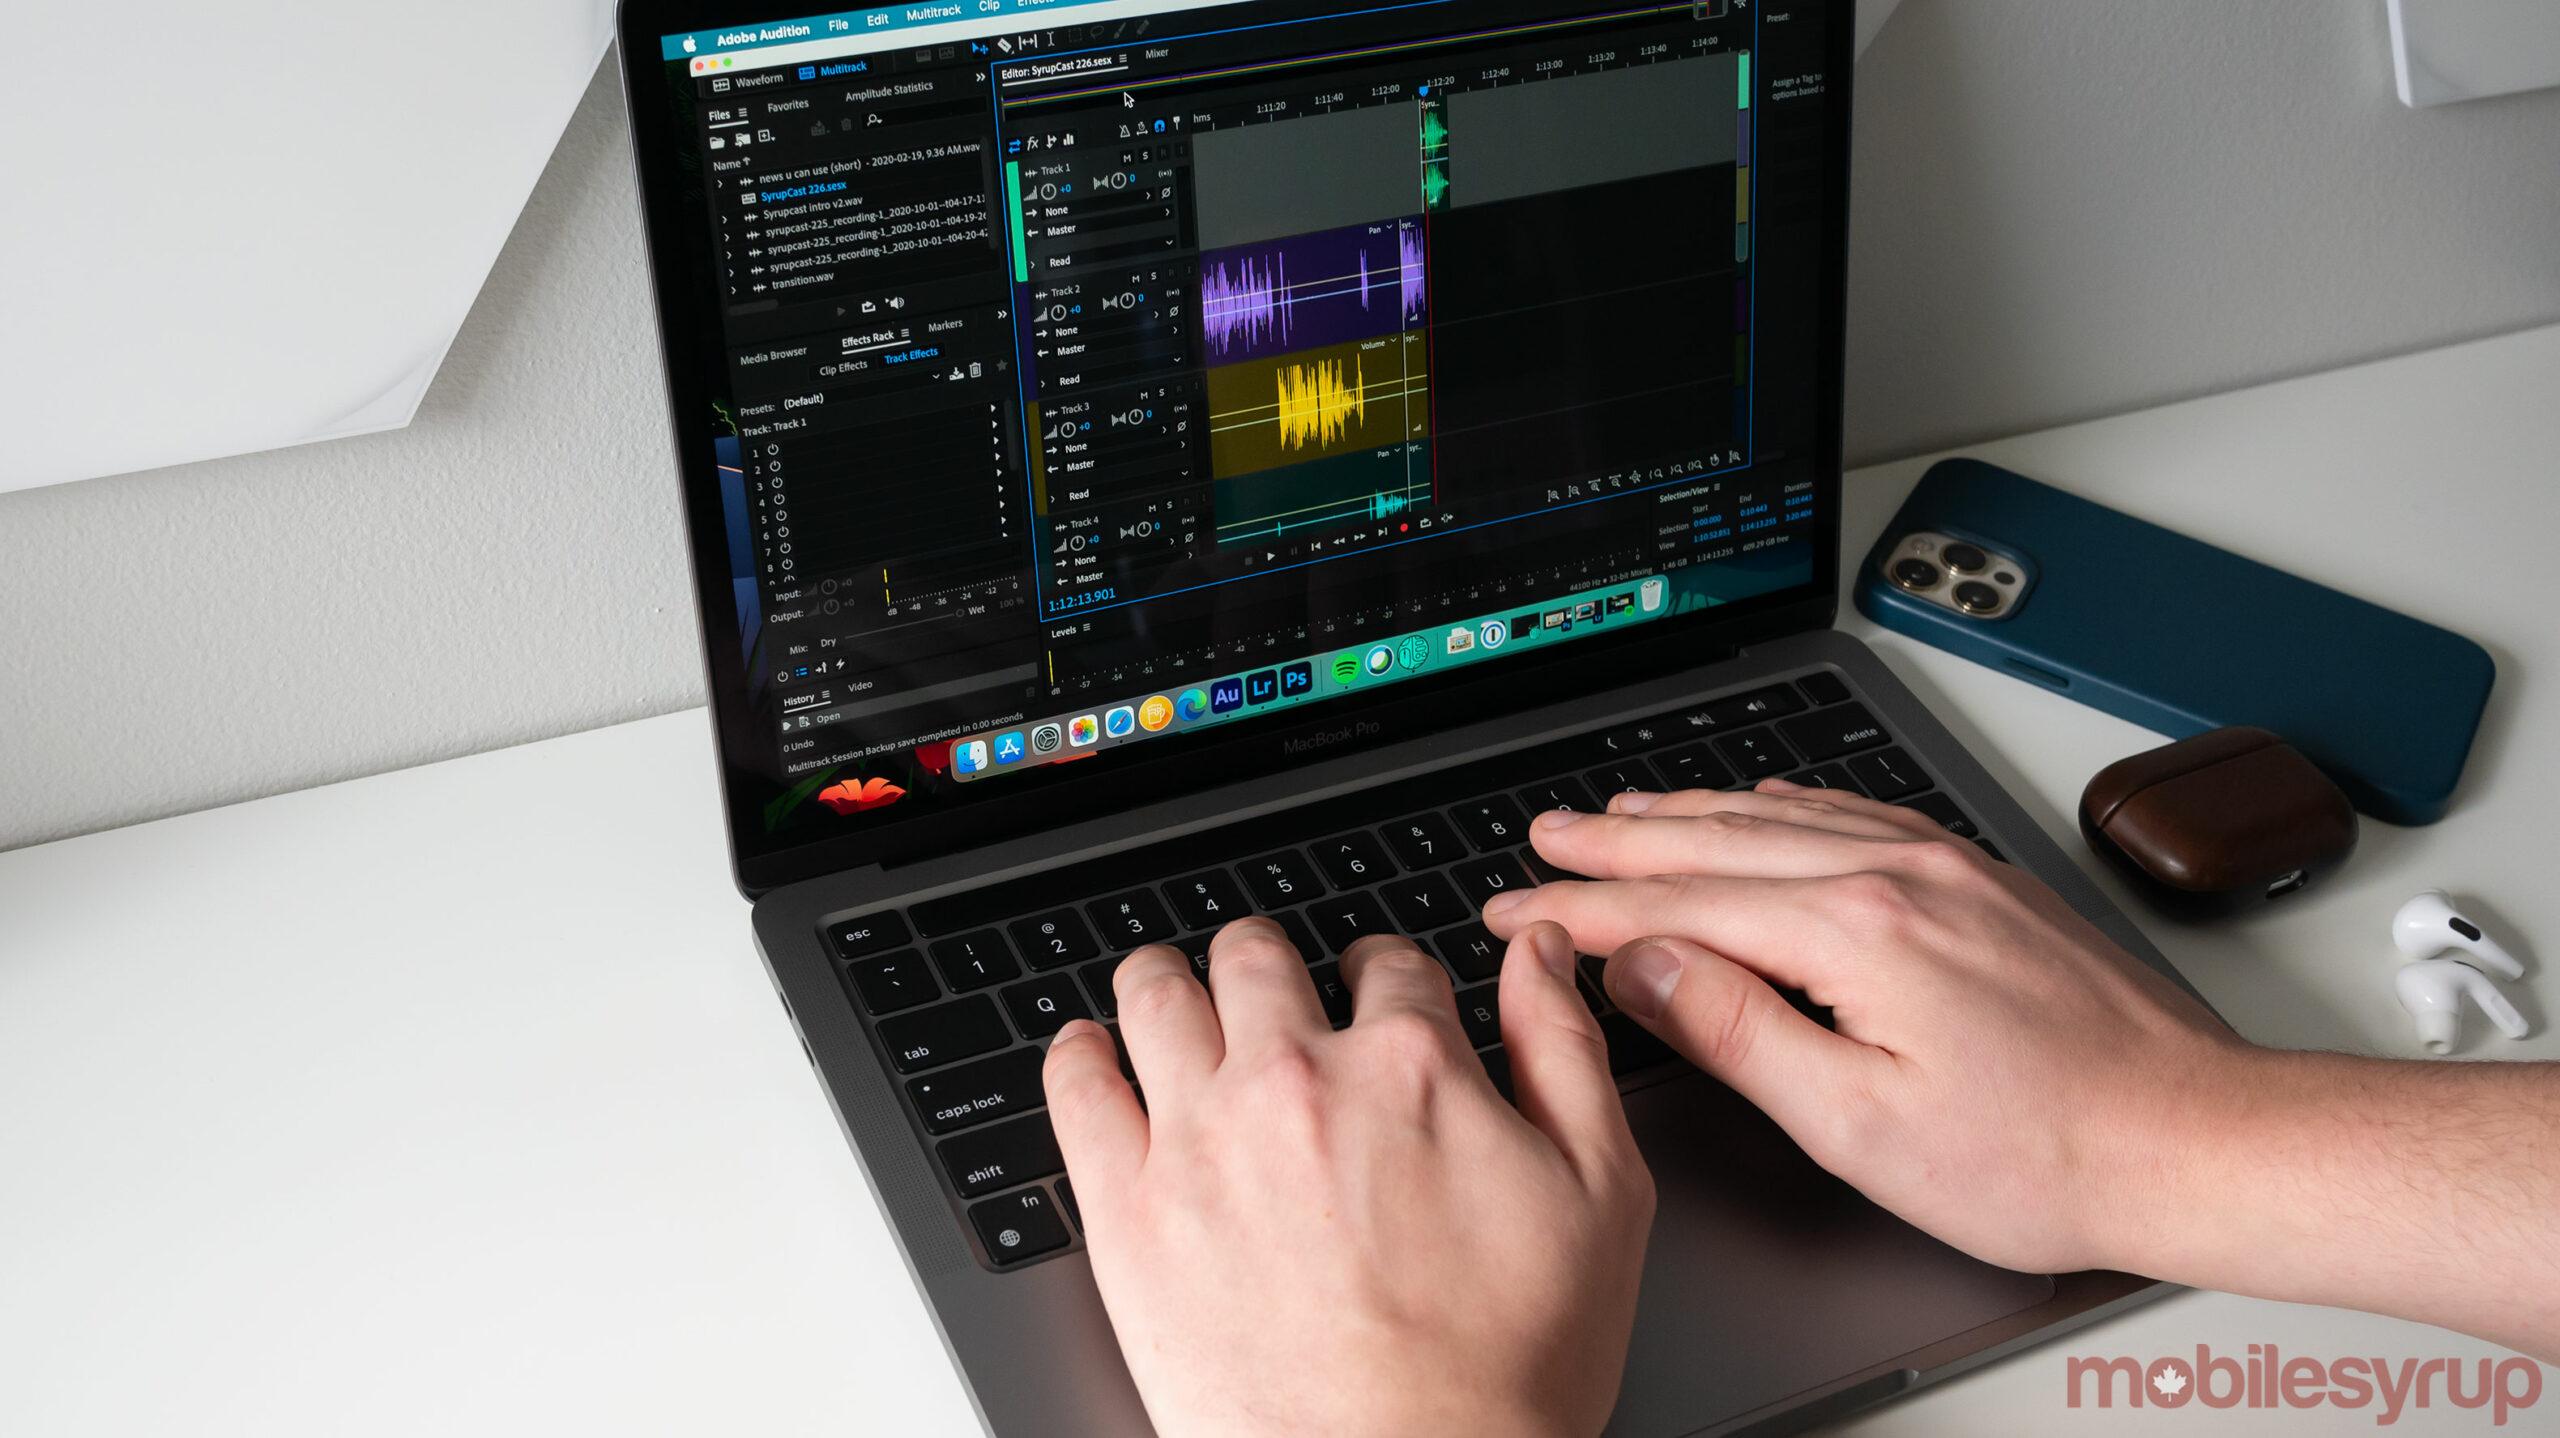 MacBook Pro with M1